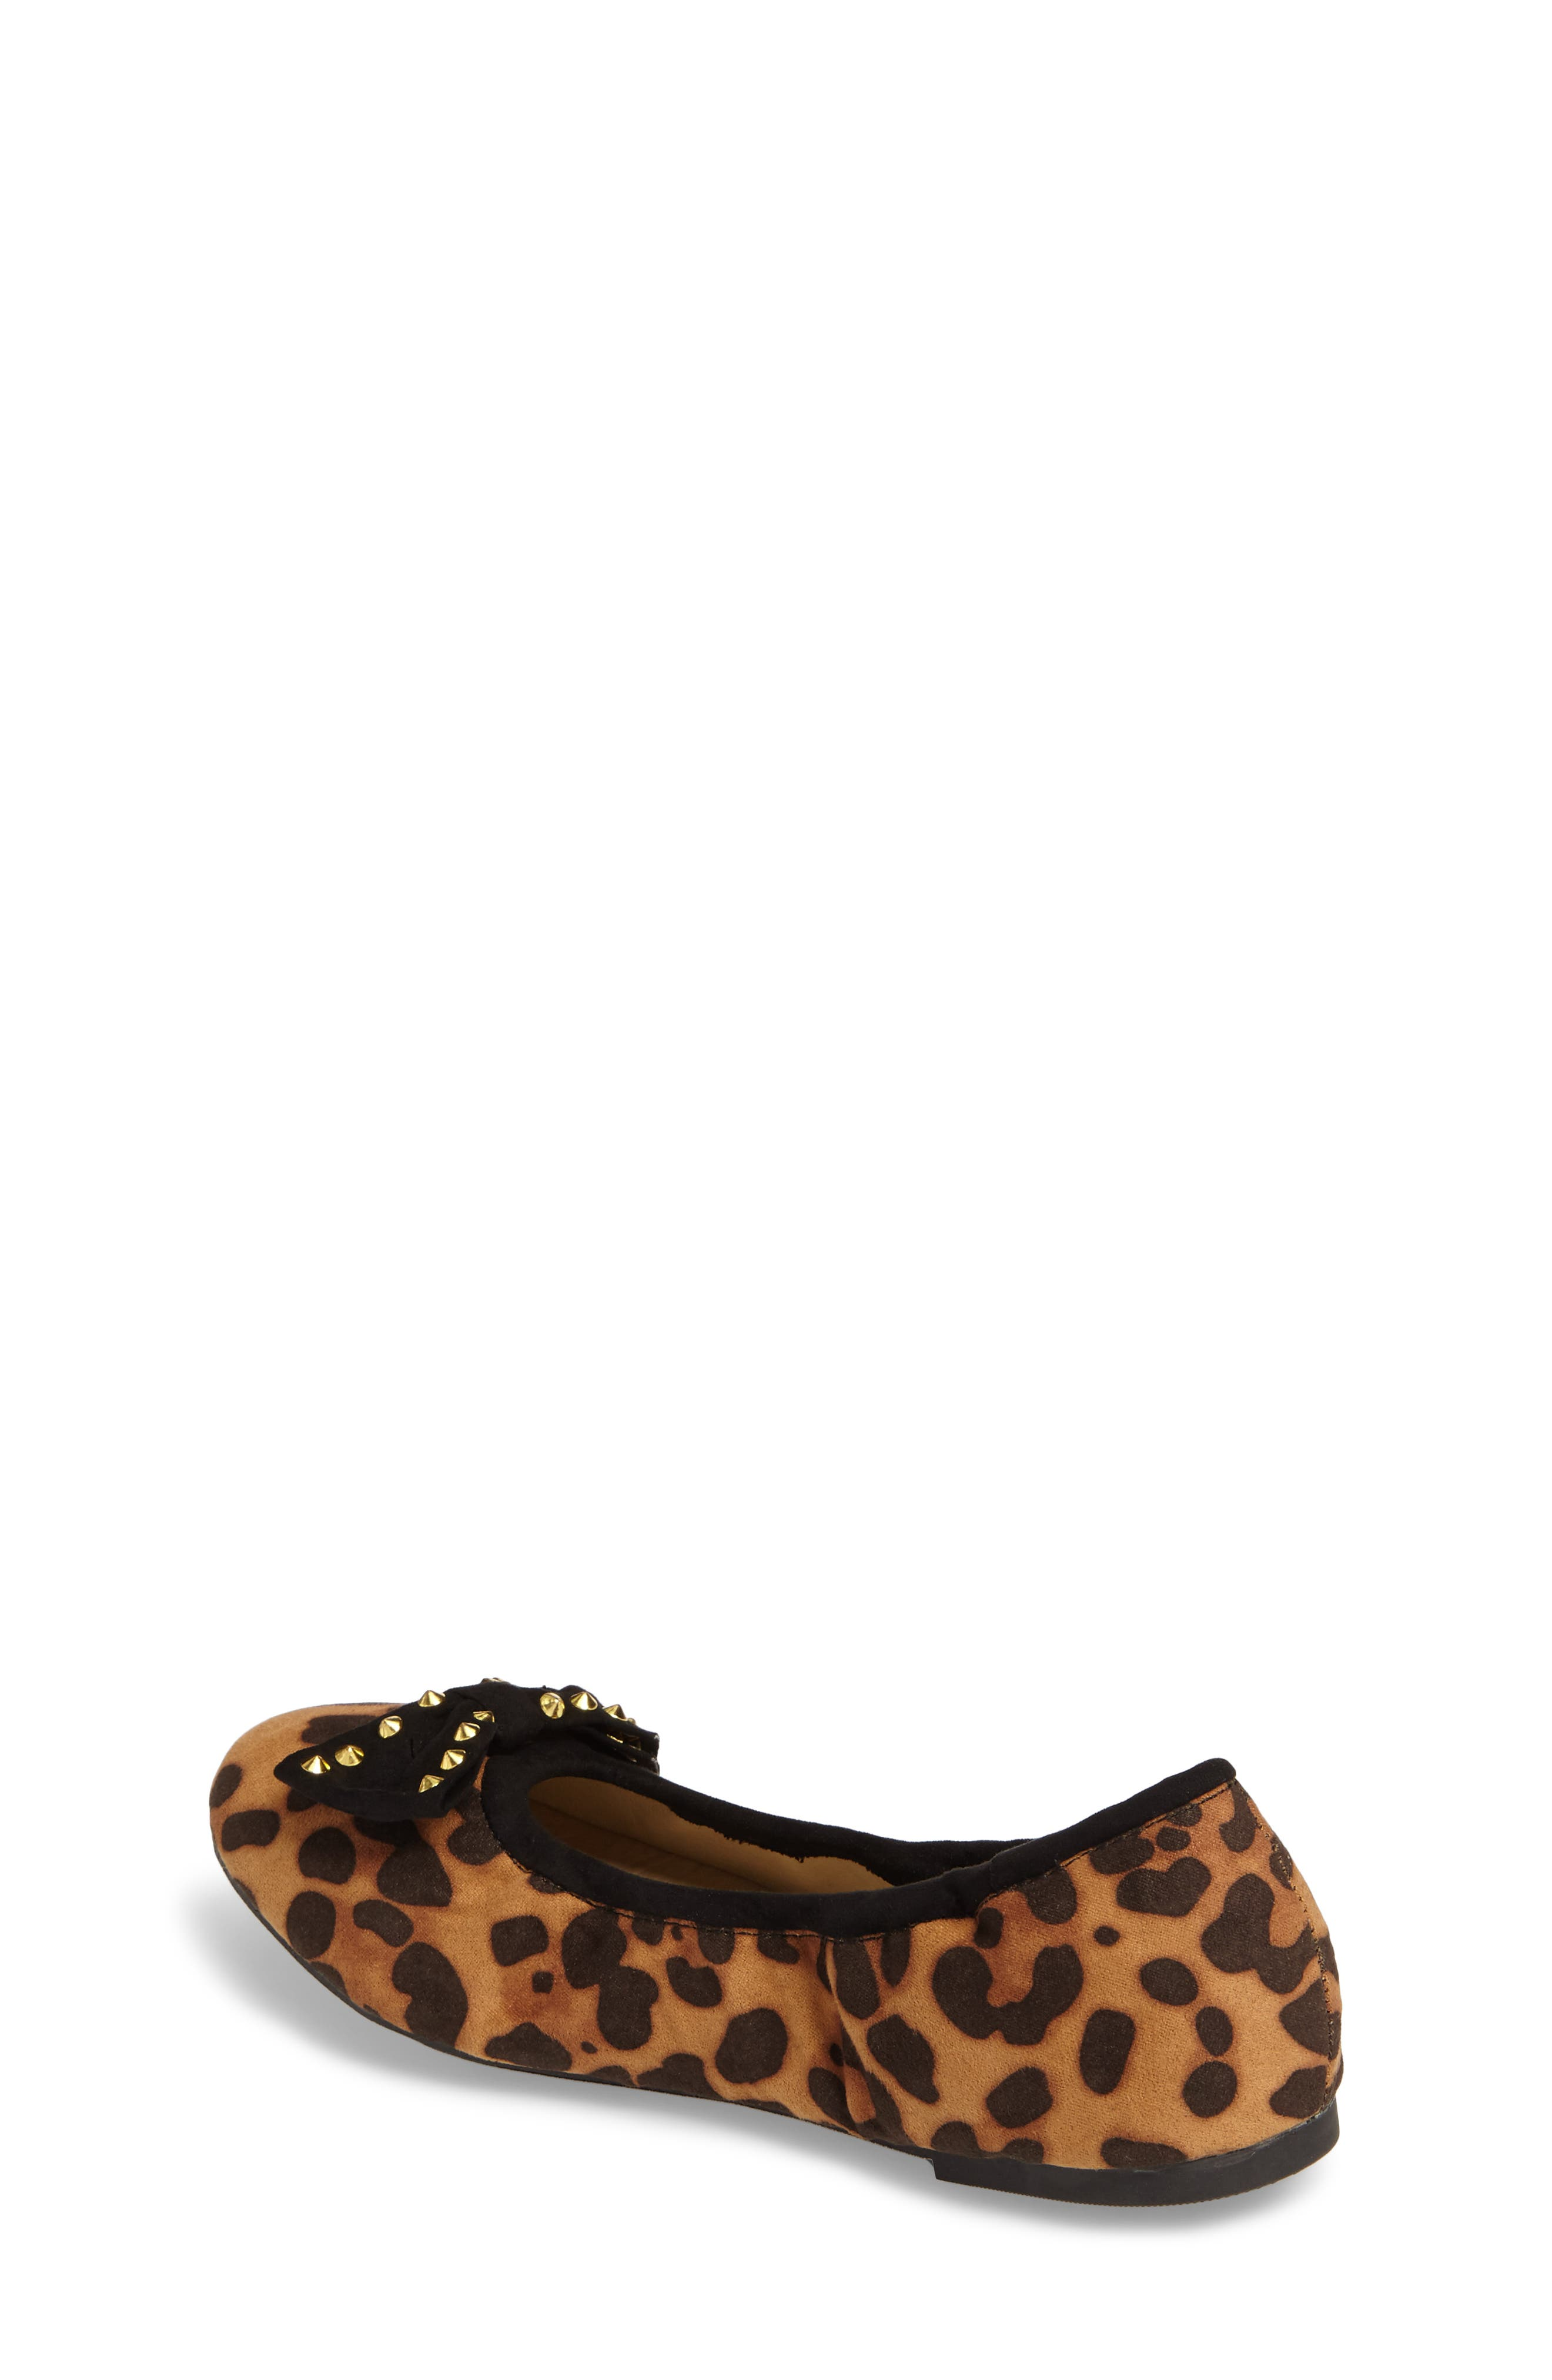 'Felicia' Ballet Flat,                             Alternate thumbnail 2, color,                             Black Cheetah